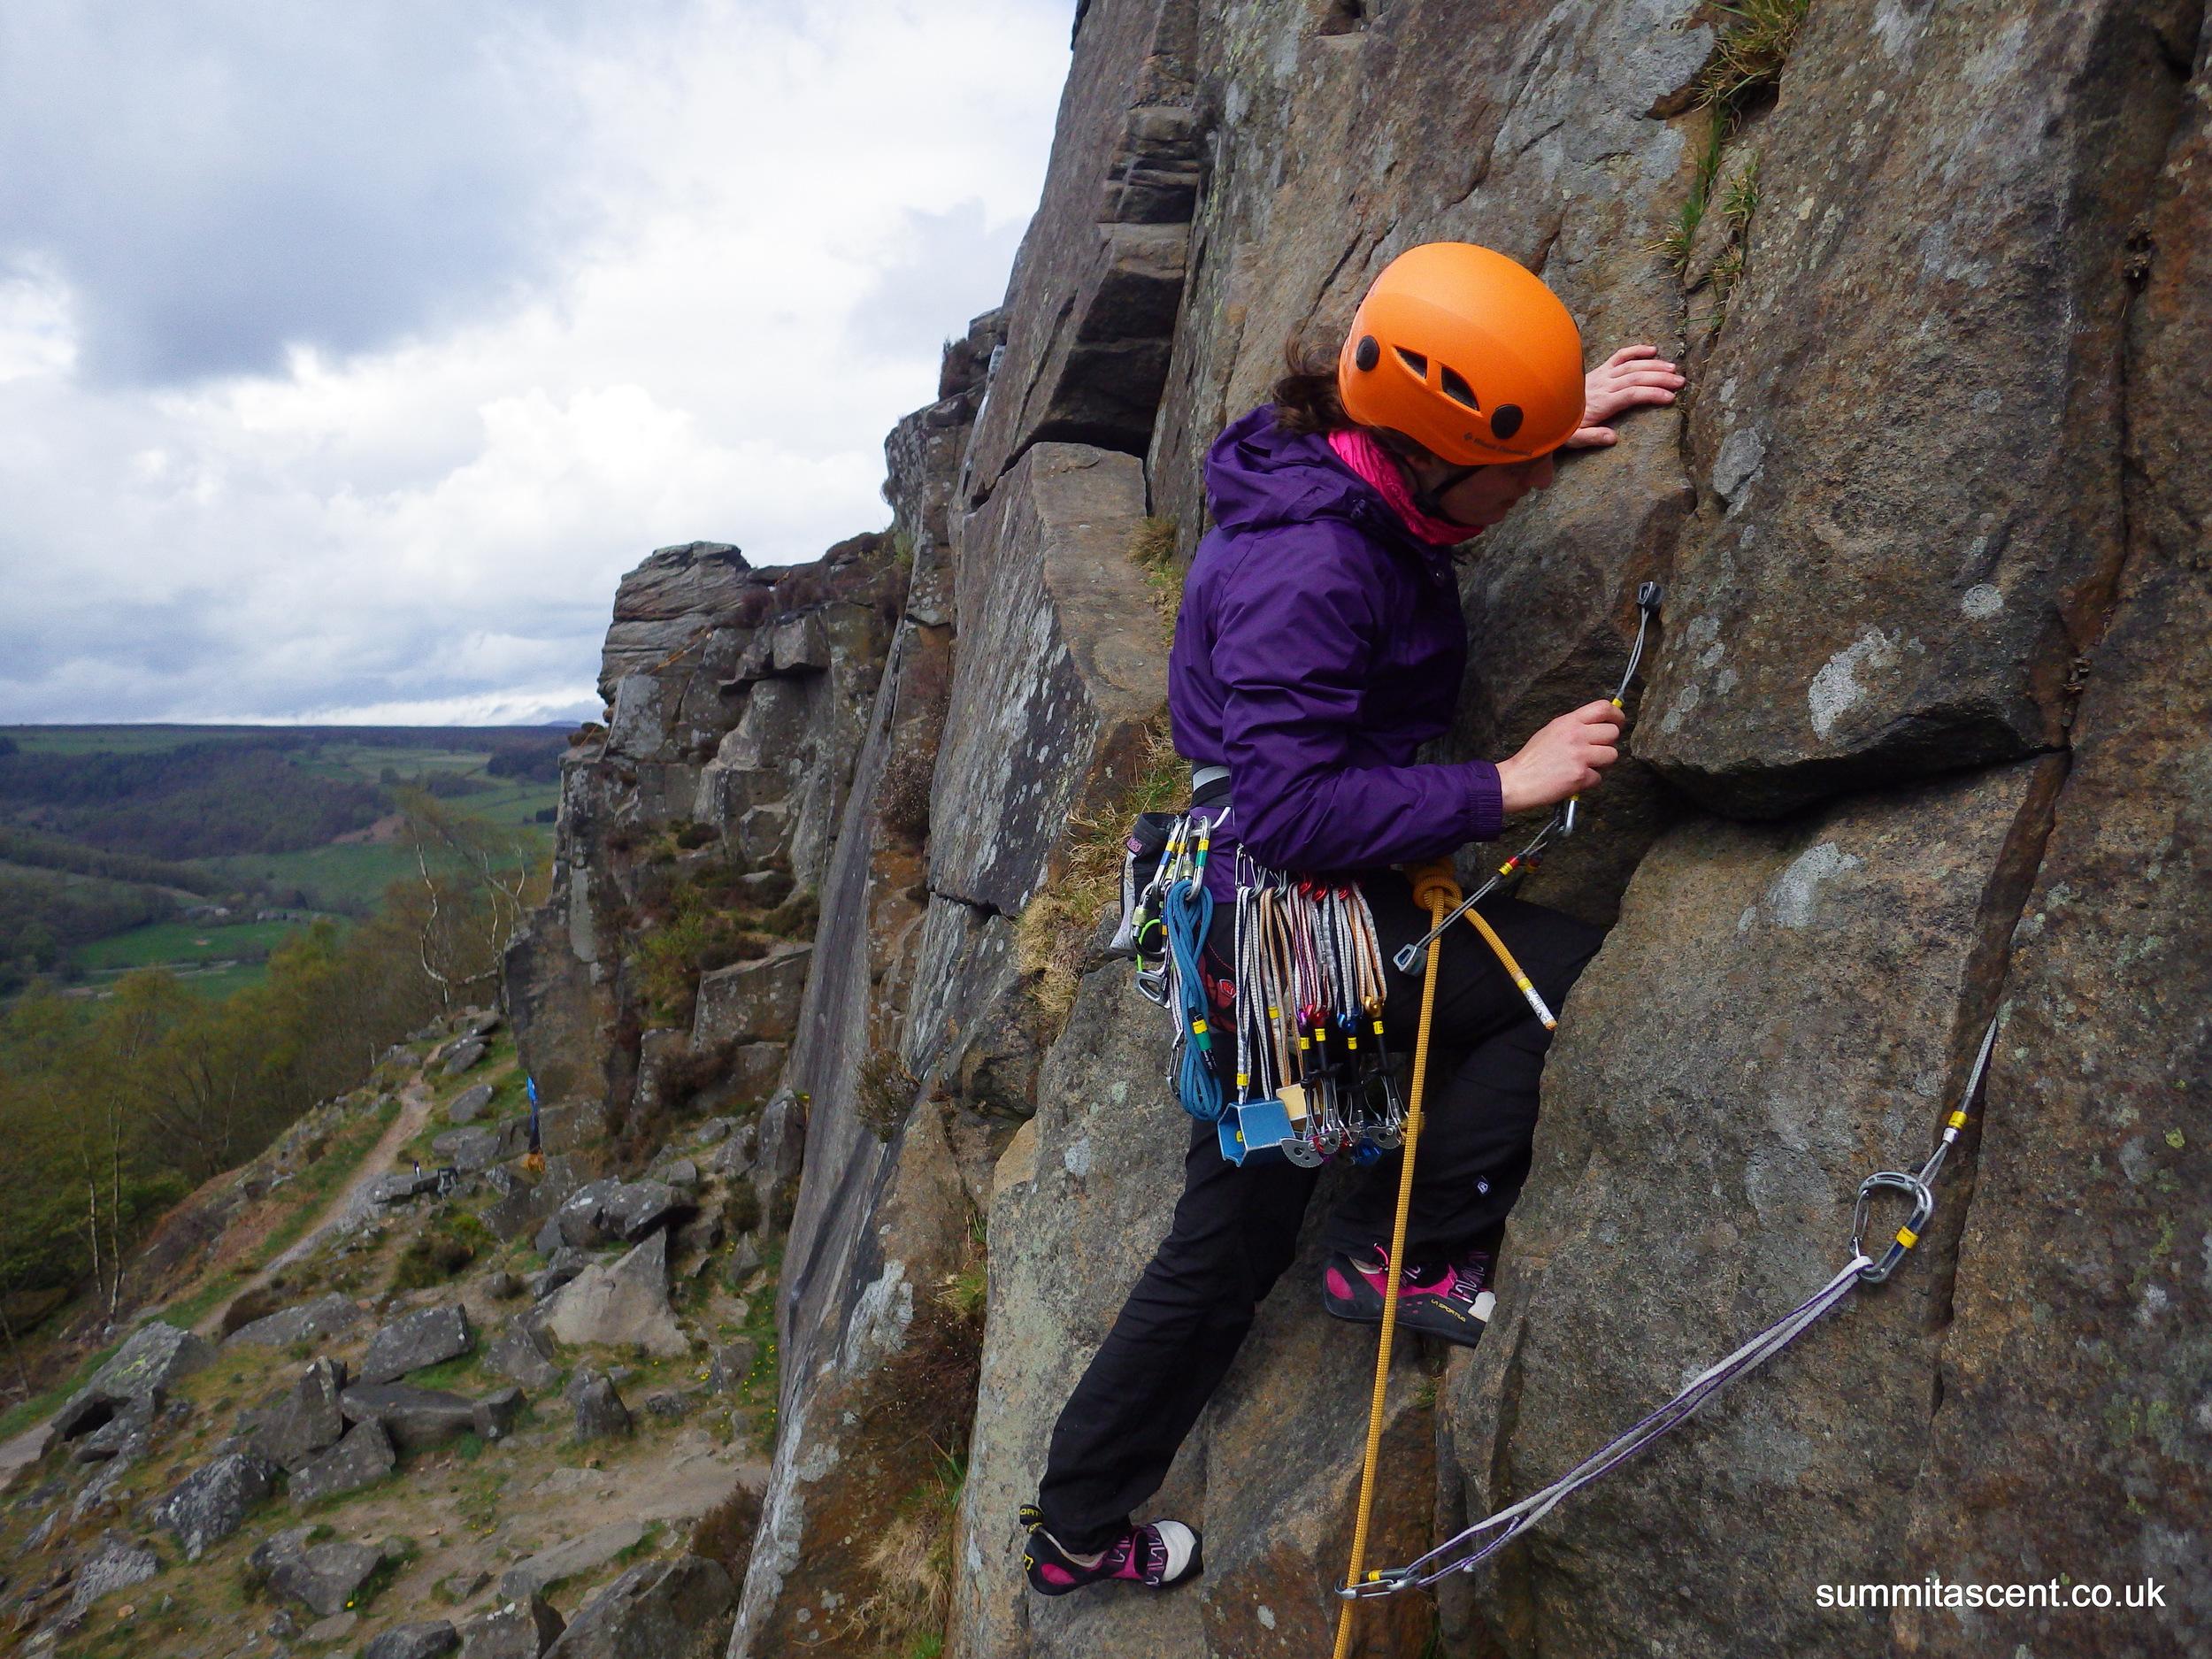 Learning to Lead, Froggat Edge, Peak District